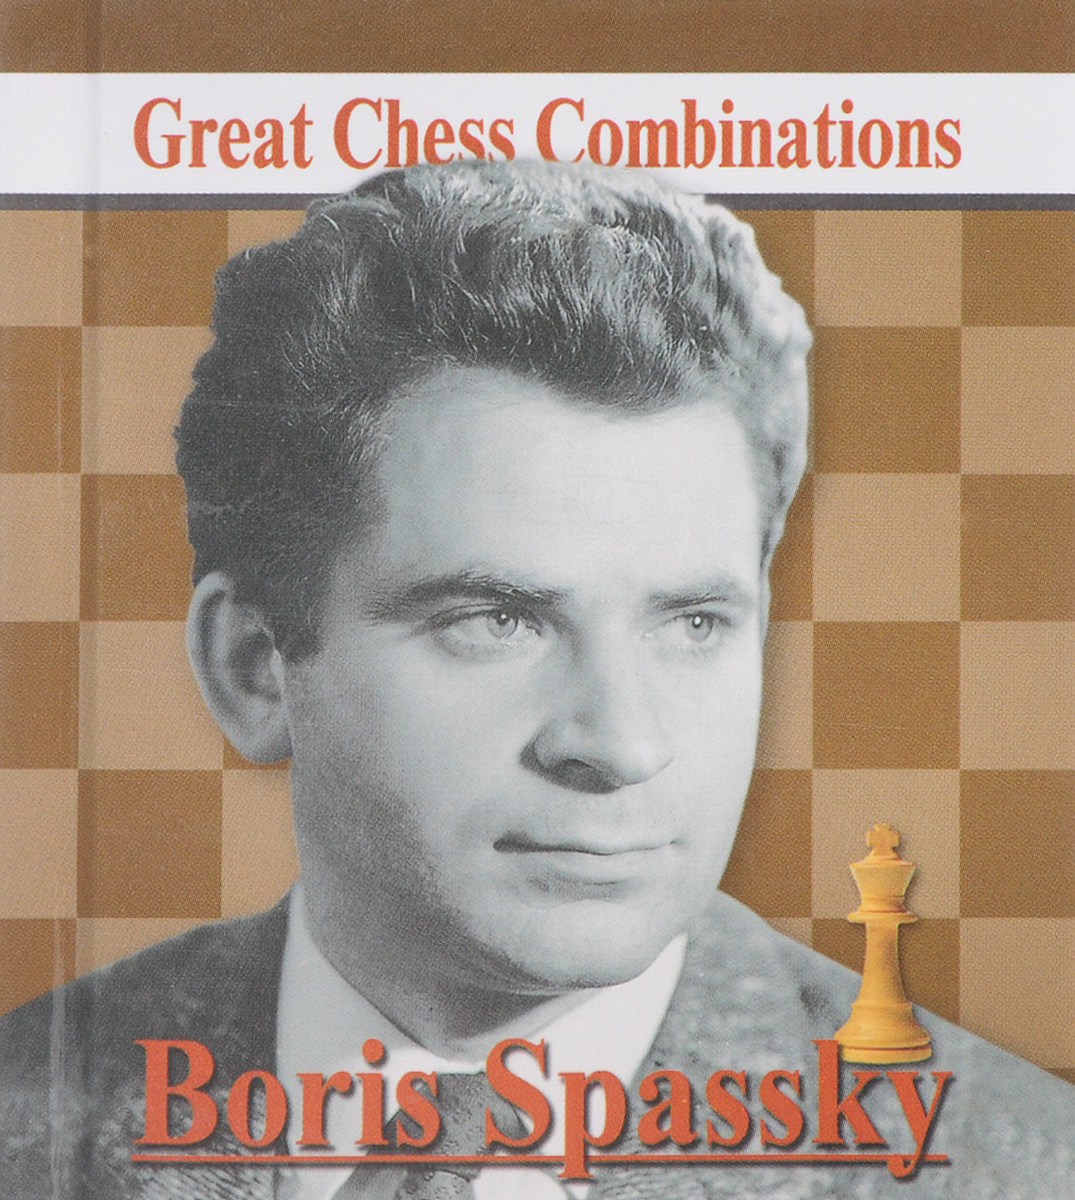 Фото - Александр Калинин Boris Spassky: Great Chess Combinations / Борис Спасский. Лучшие шахматные комбинации (миниатюрное издание) калинин а михаил таль лучшие шахматные комбинации